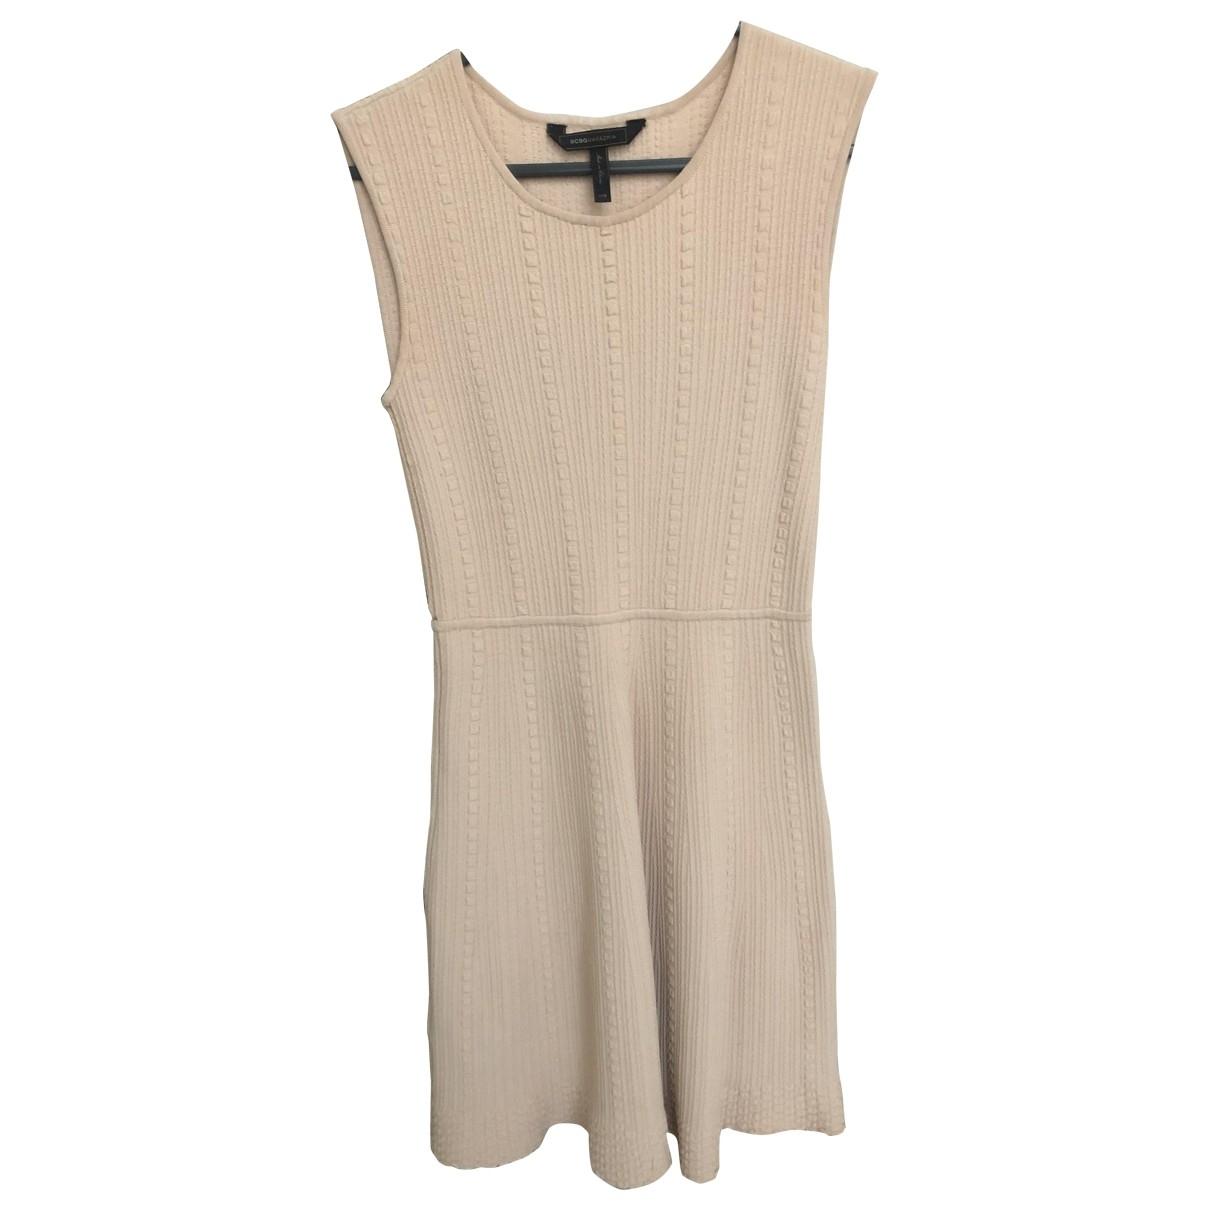 Bcbg Max Azria \N Pink dress for Women 34 FR